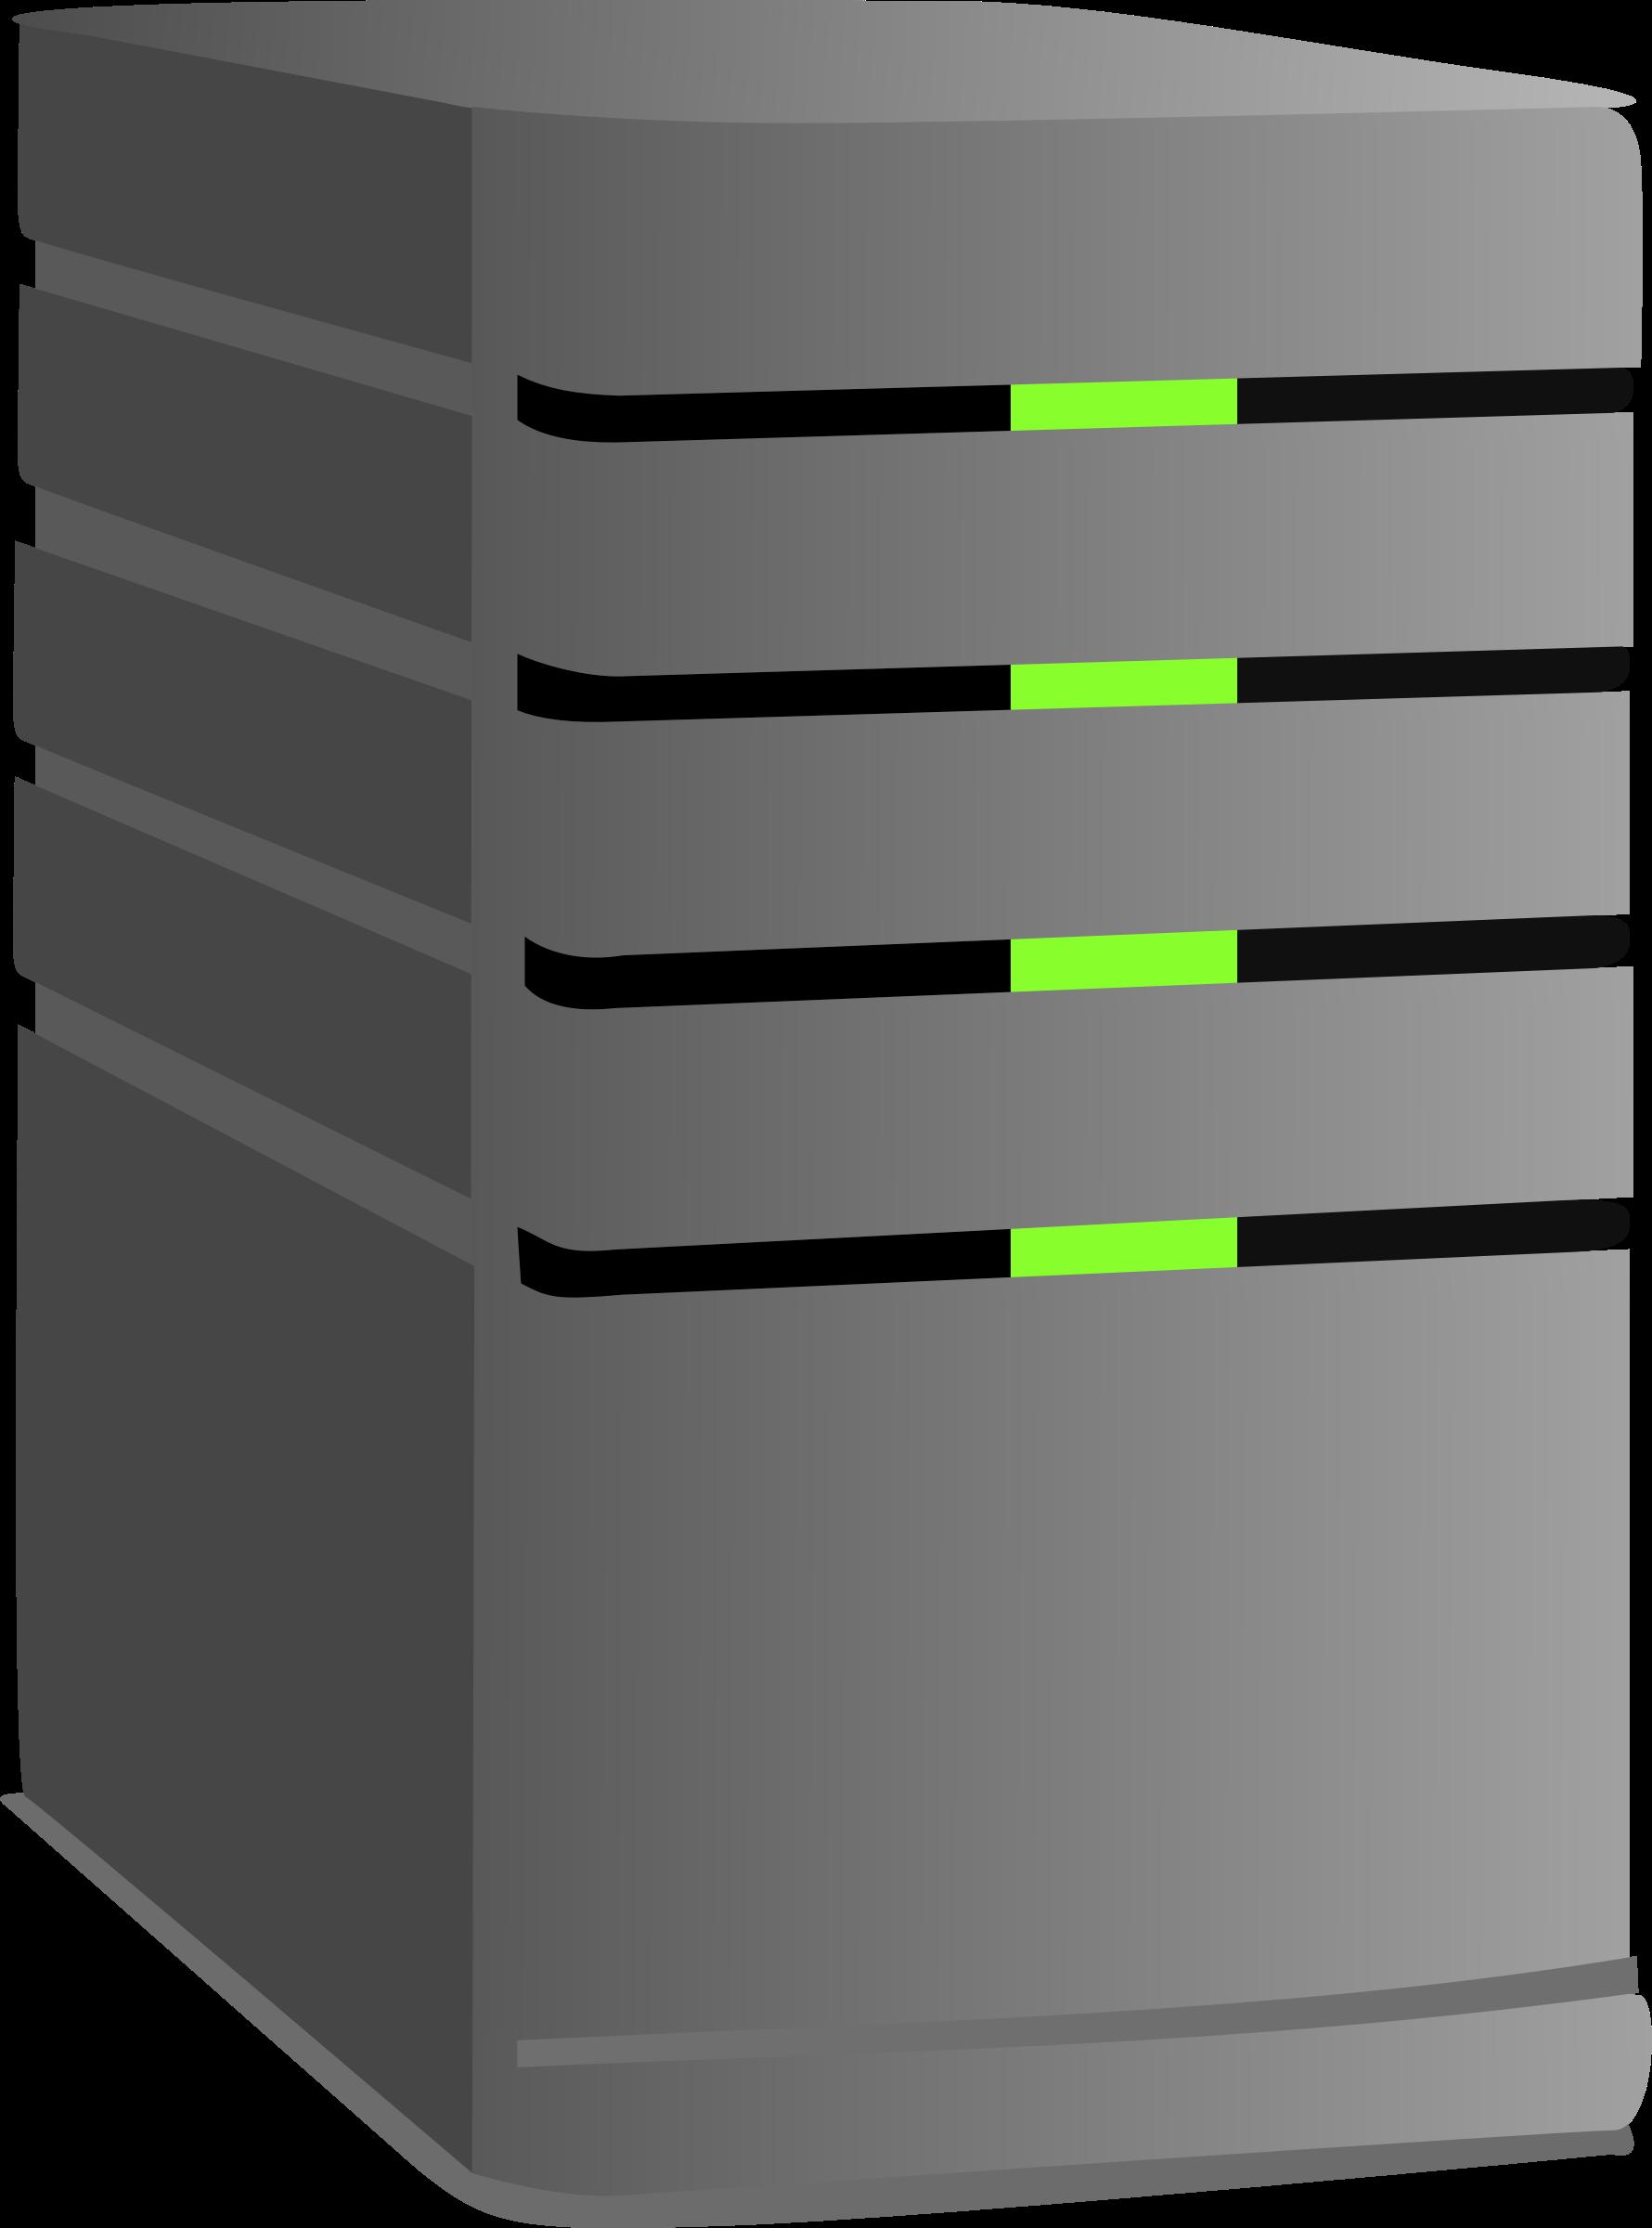 Clipart - Server